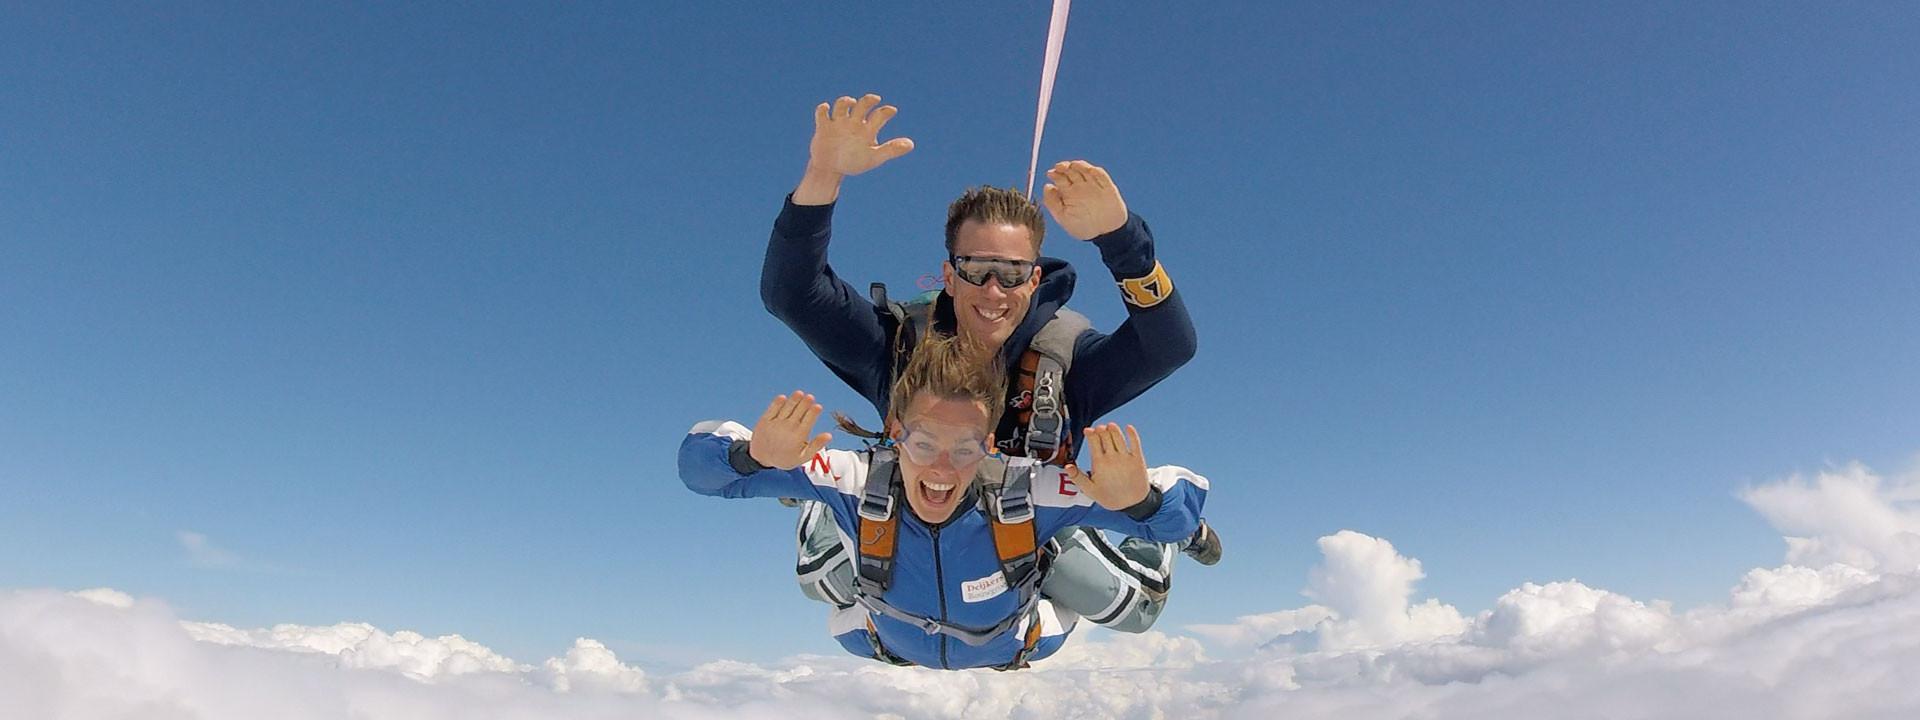 Website ontwikkeling met uitgebreide boekingsmodule voor Skydive ENPC uit Breda